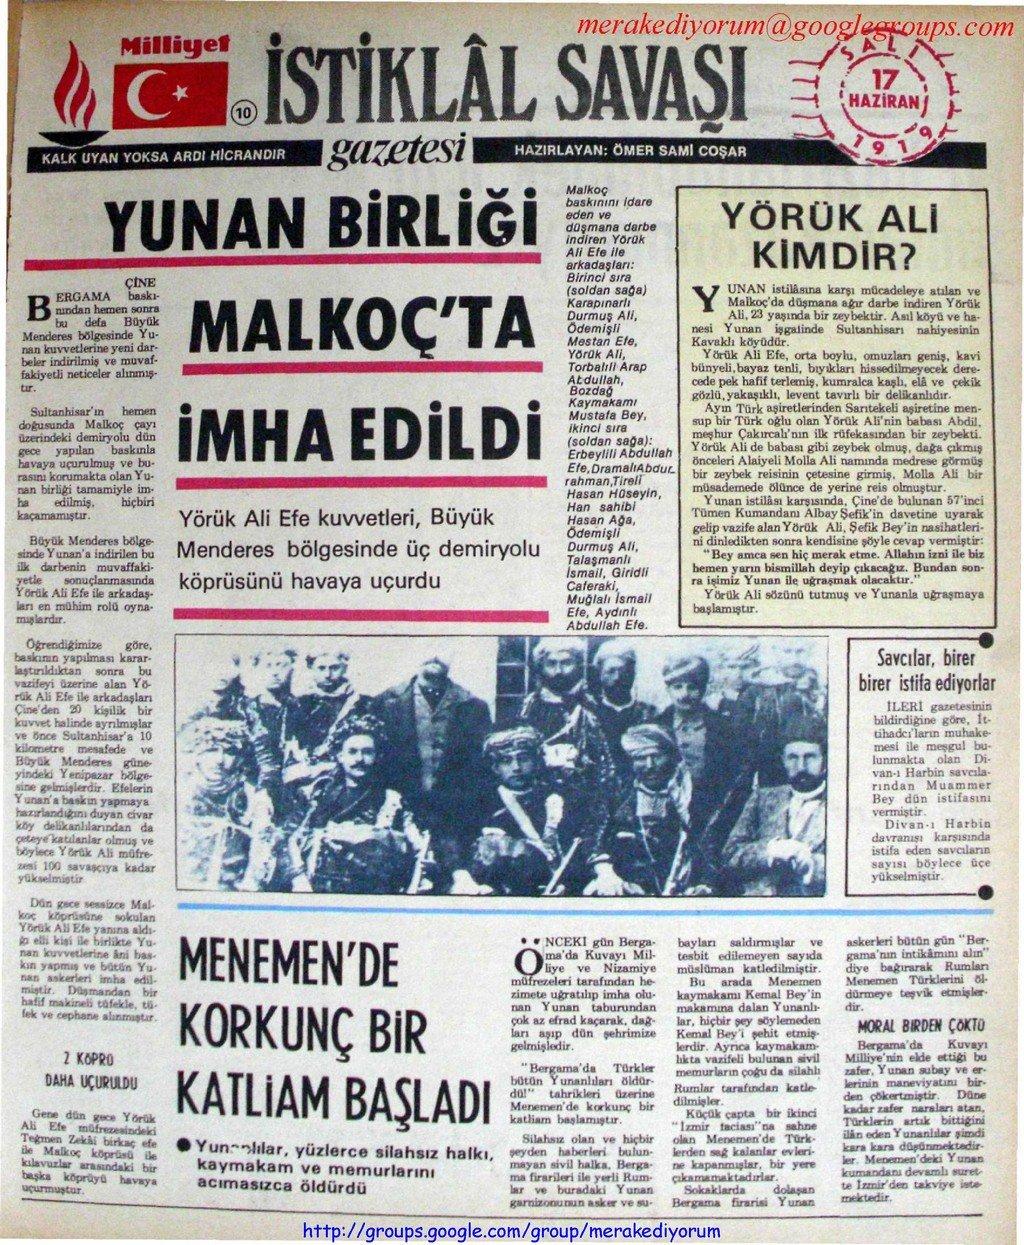 istiklal savaşı gazetesi - 17 haziran 1919